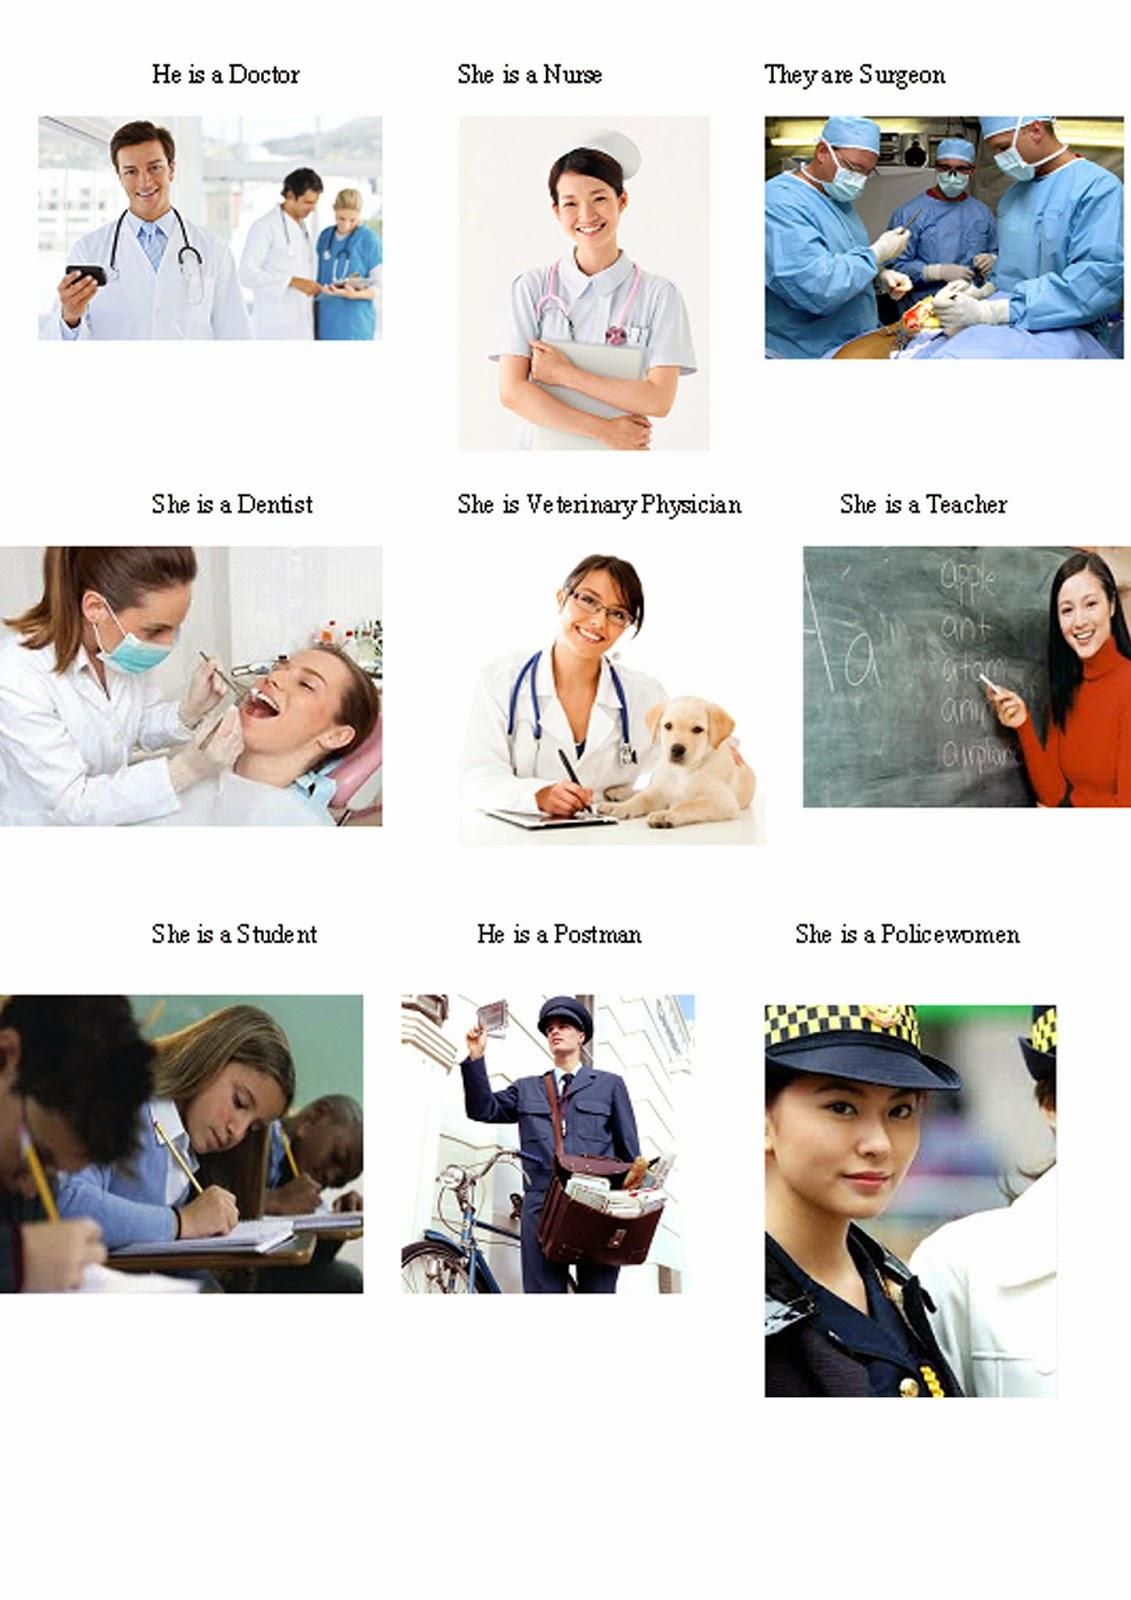 diaznet tugas anak sekolahan nama buah dan profesi